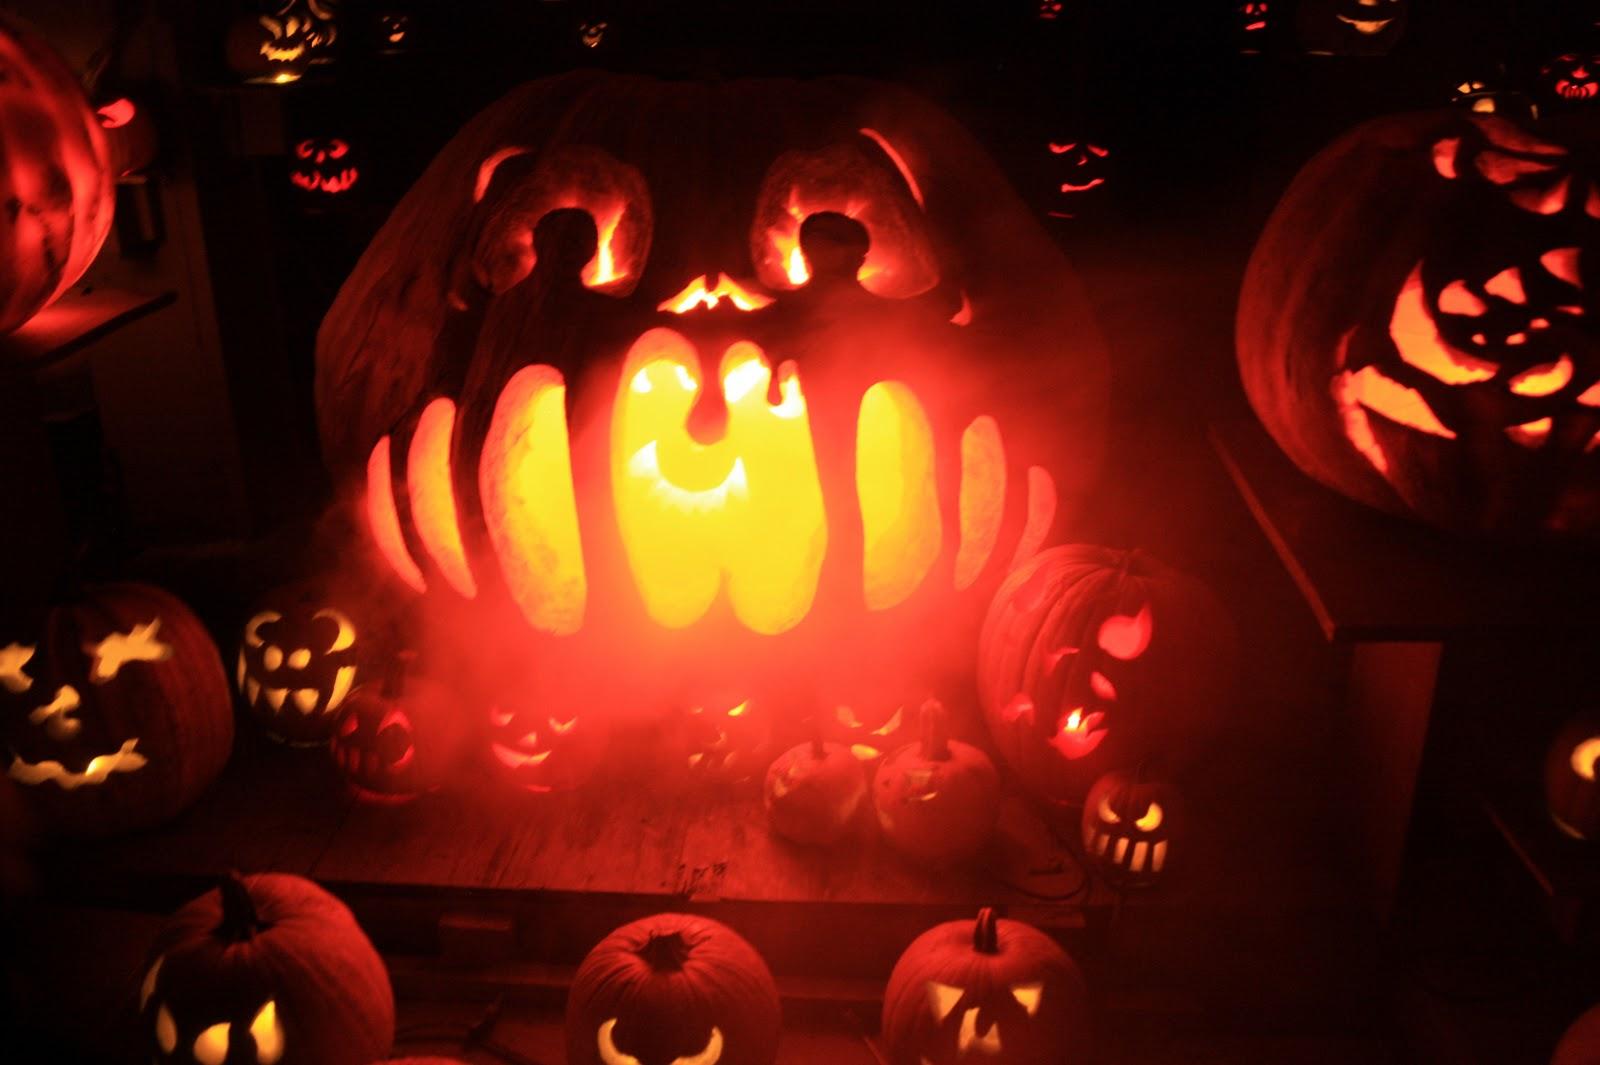 visibly moved: jack-o-lantern spectacular